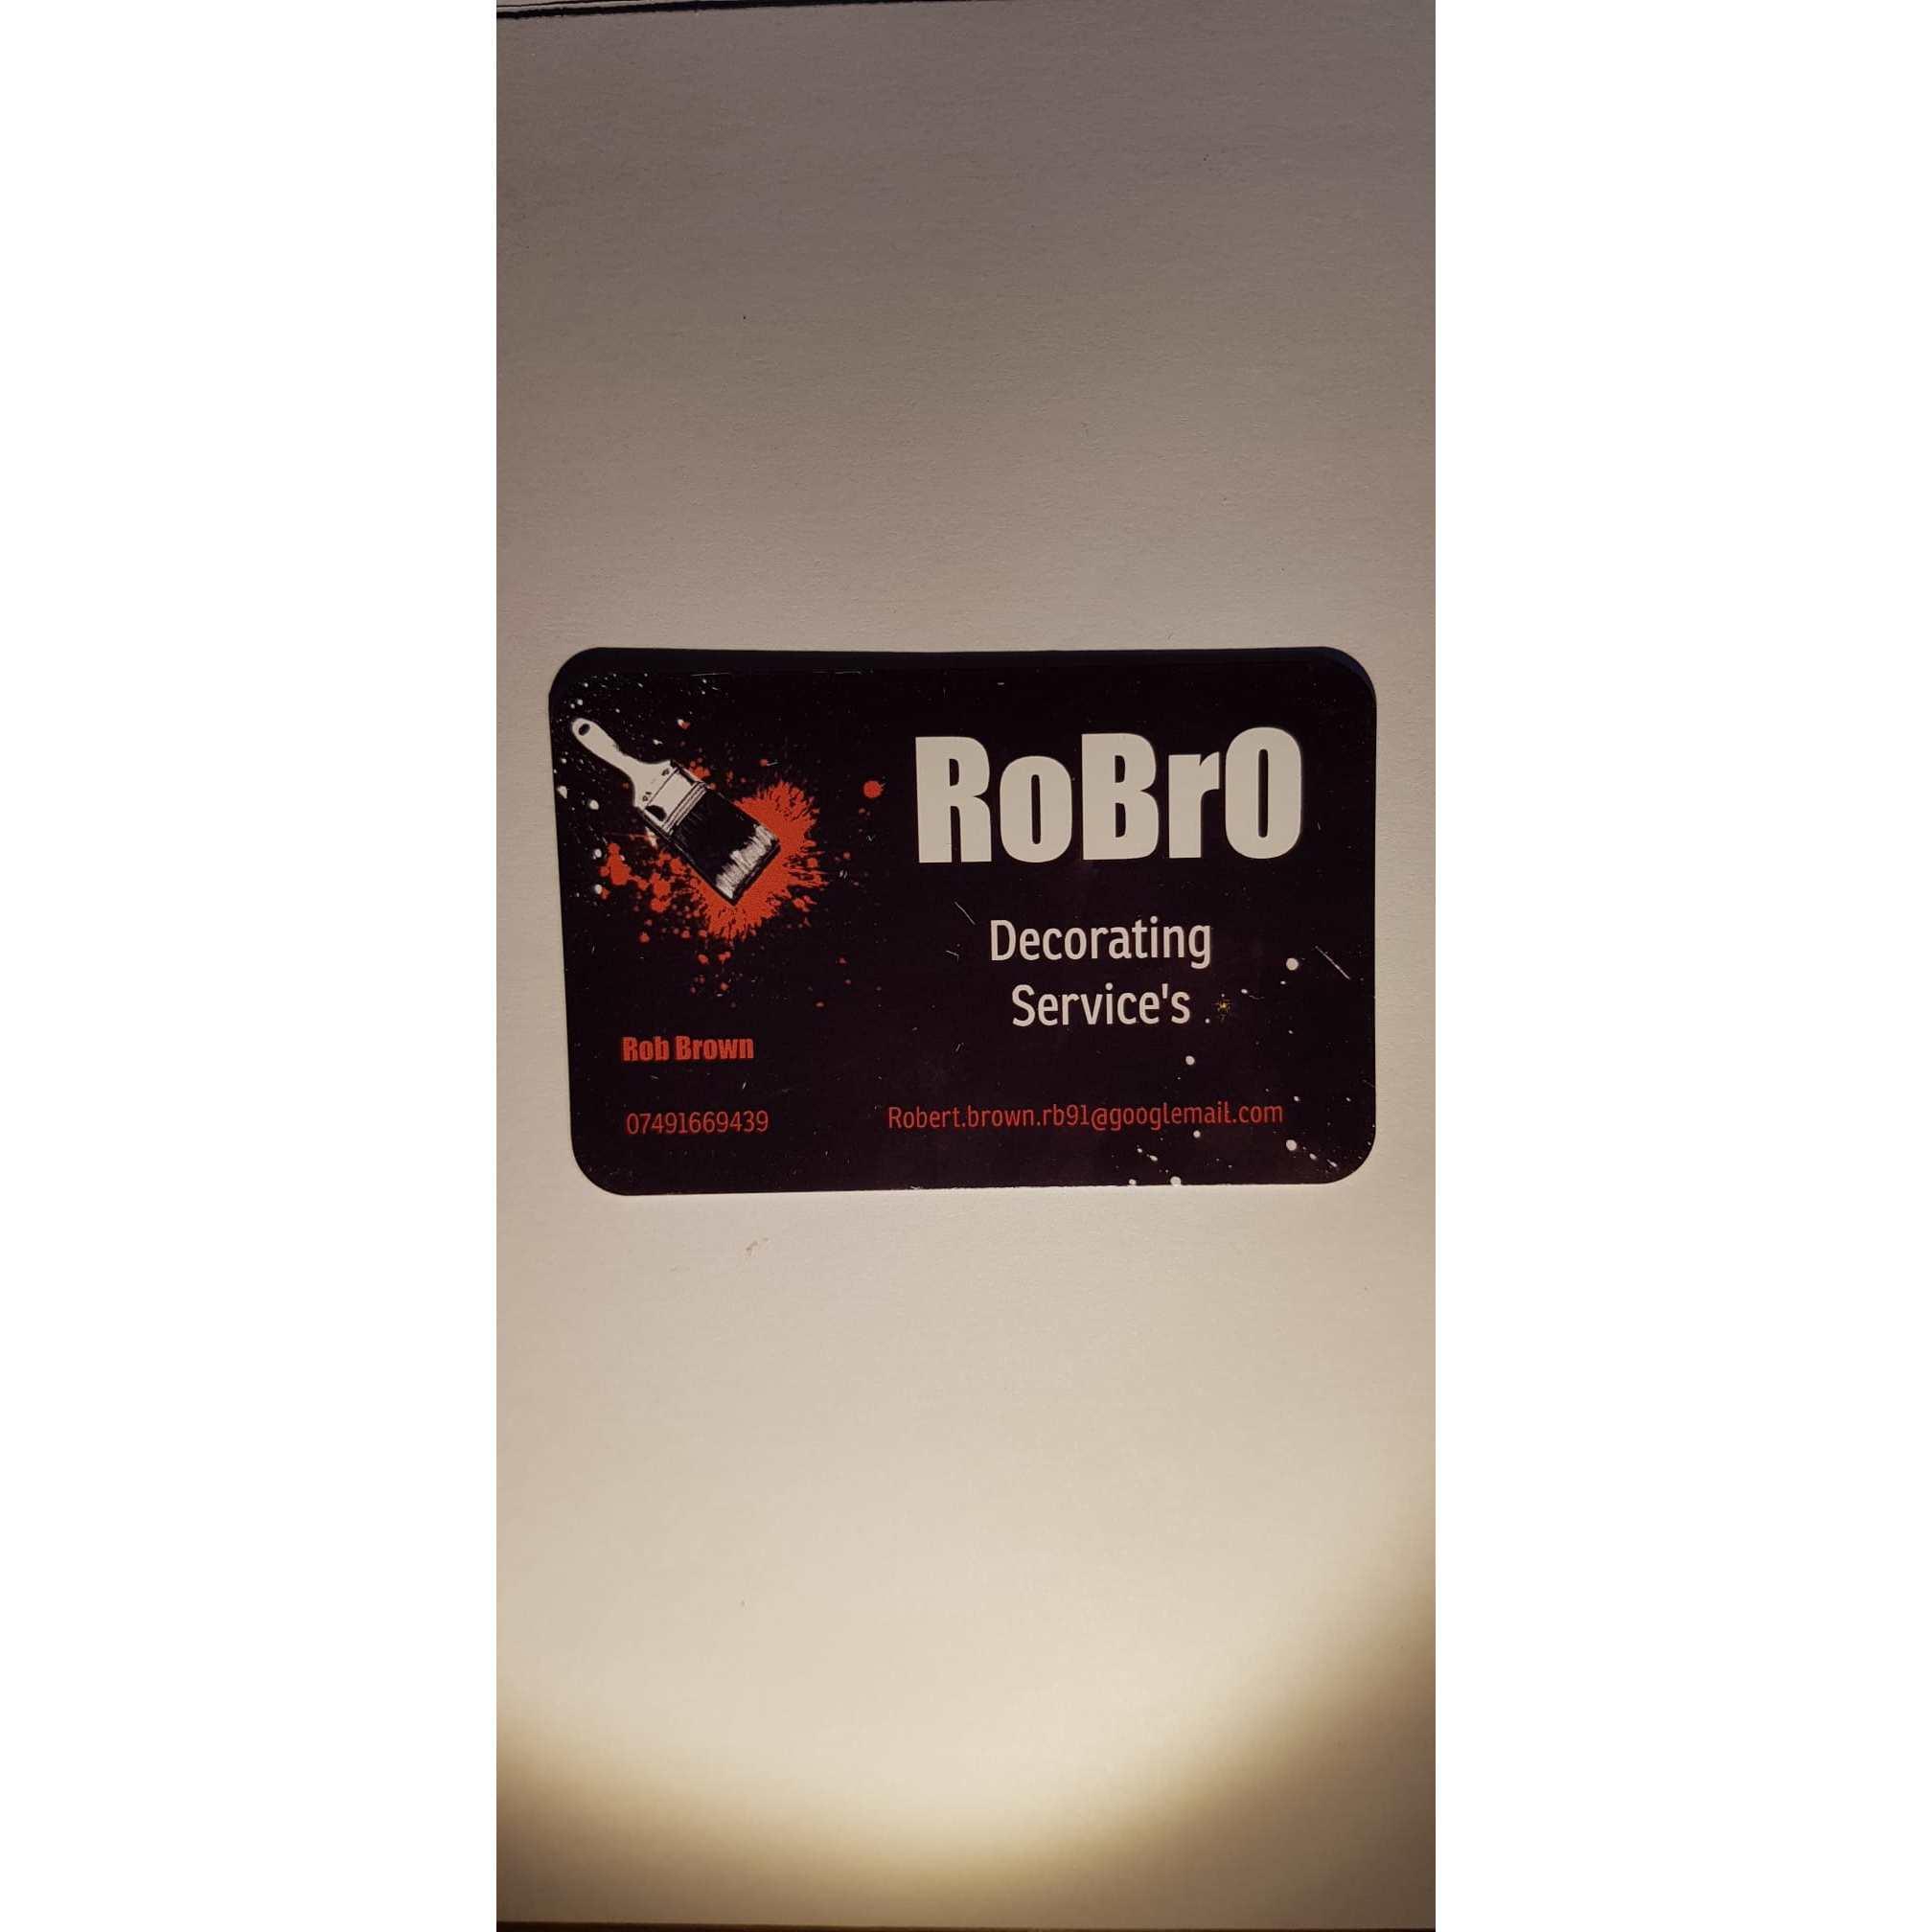 RoBrO Decorating Services - Hinckley, Leicestershire LE10 2FJ - 07491 669439 | ShowMeLocal.com